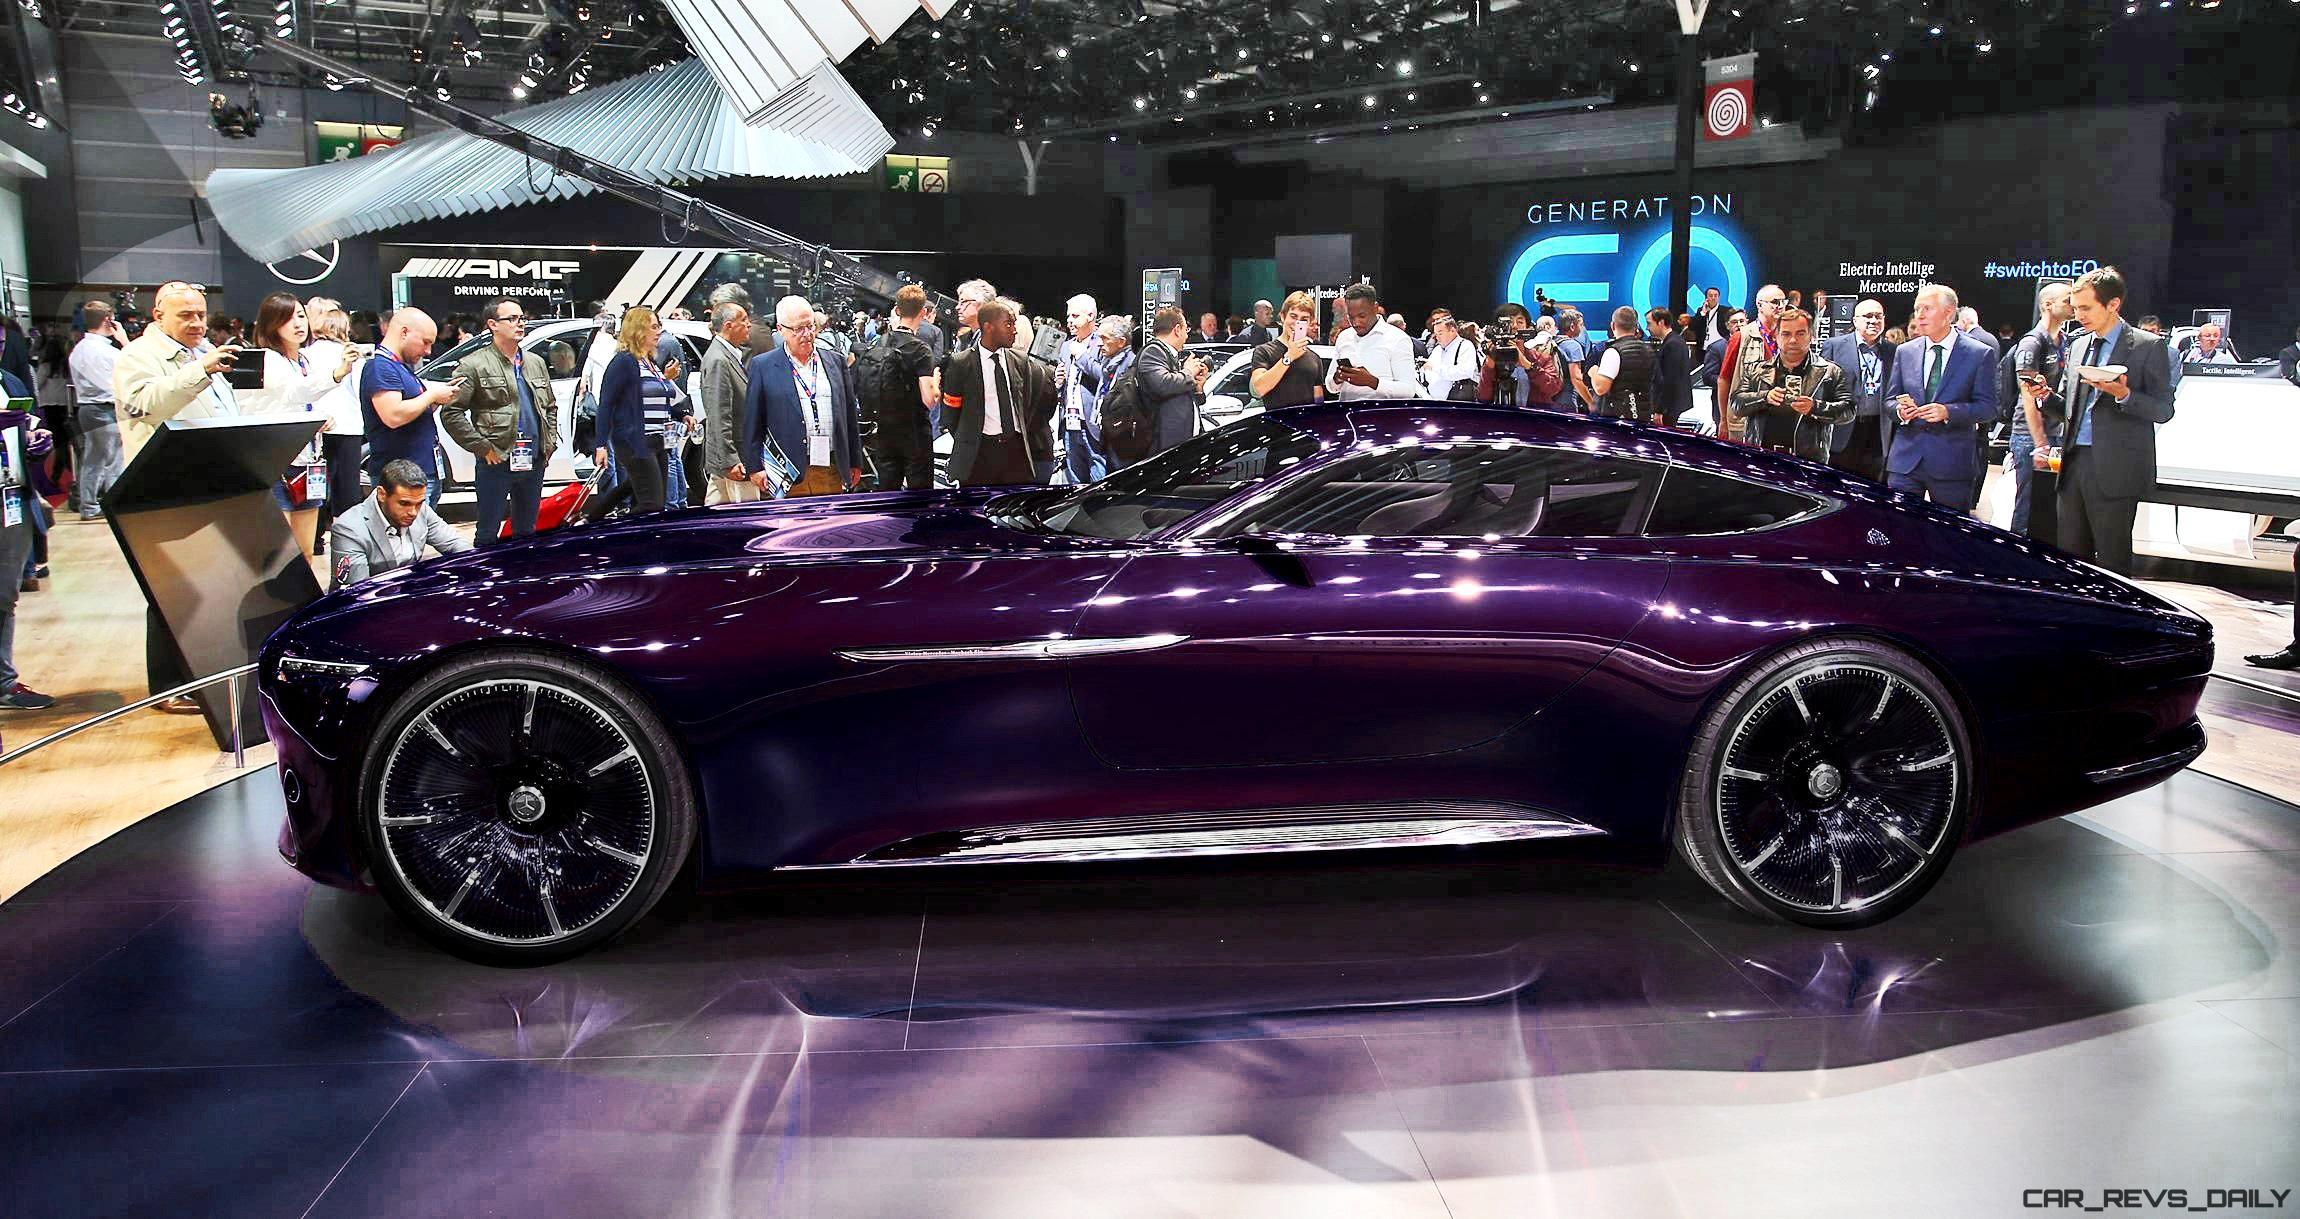 2016-vision-mercedes-maybach-dzvc6-concept-15